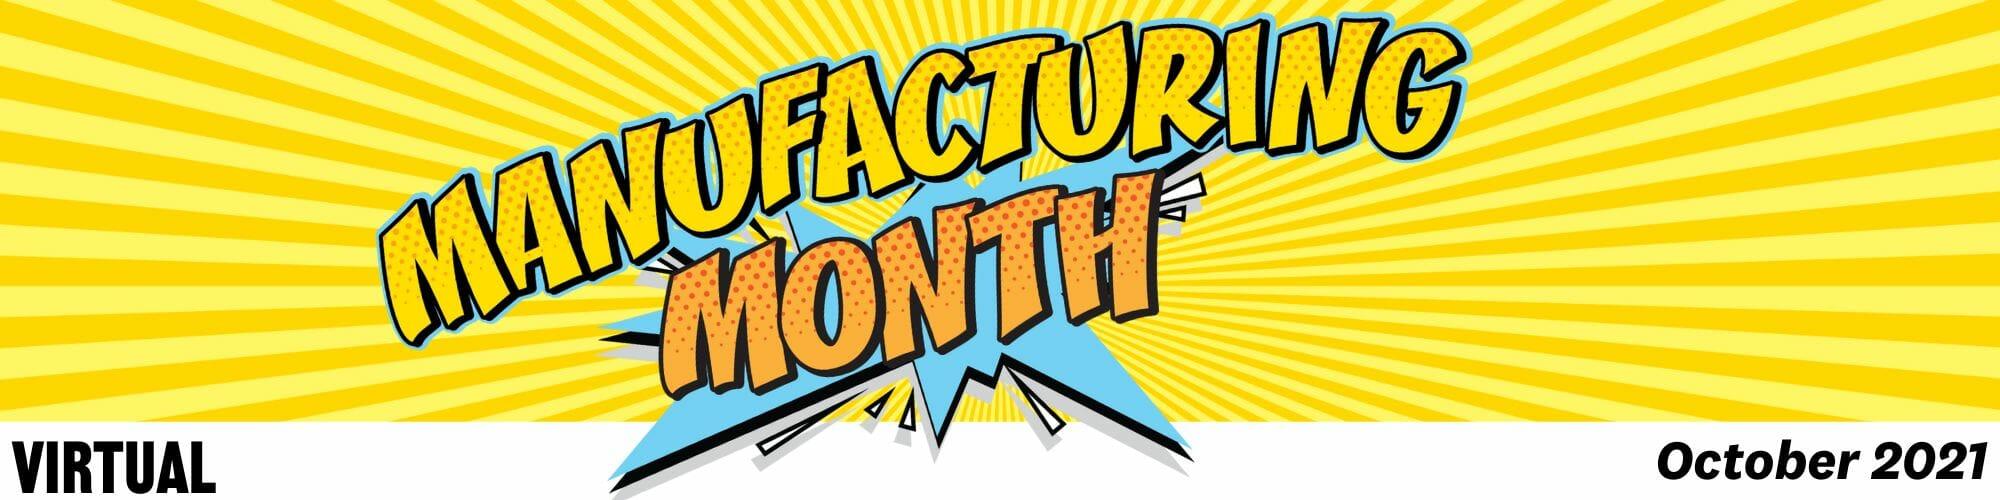 k-12 initiatives manu month image